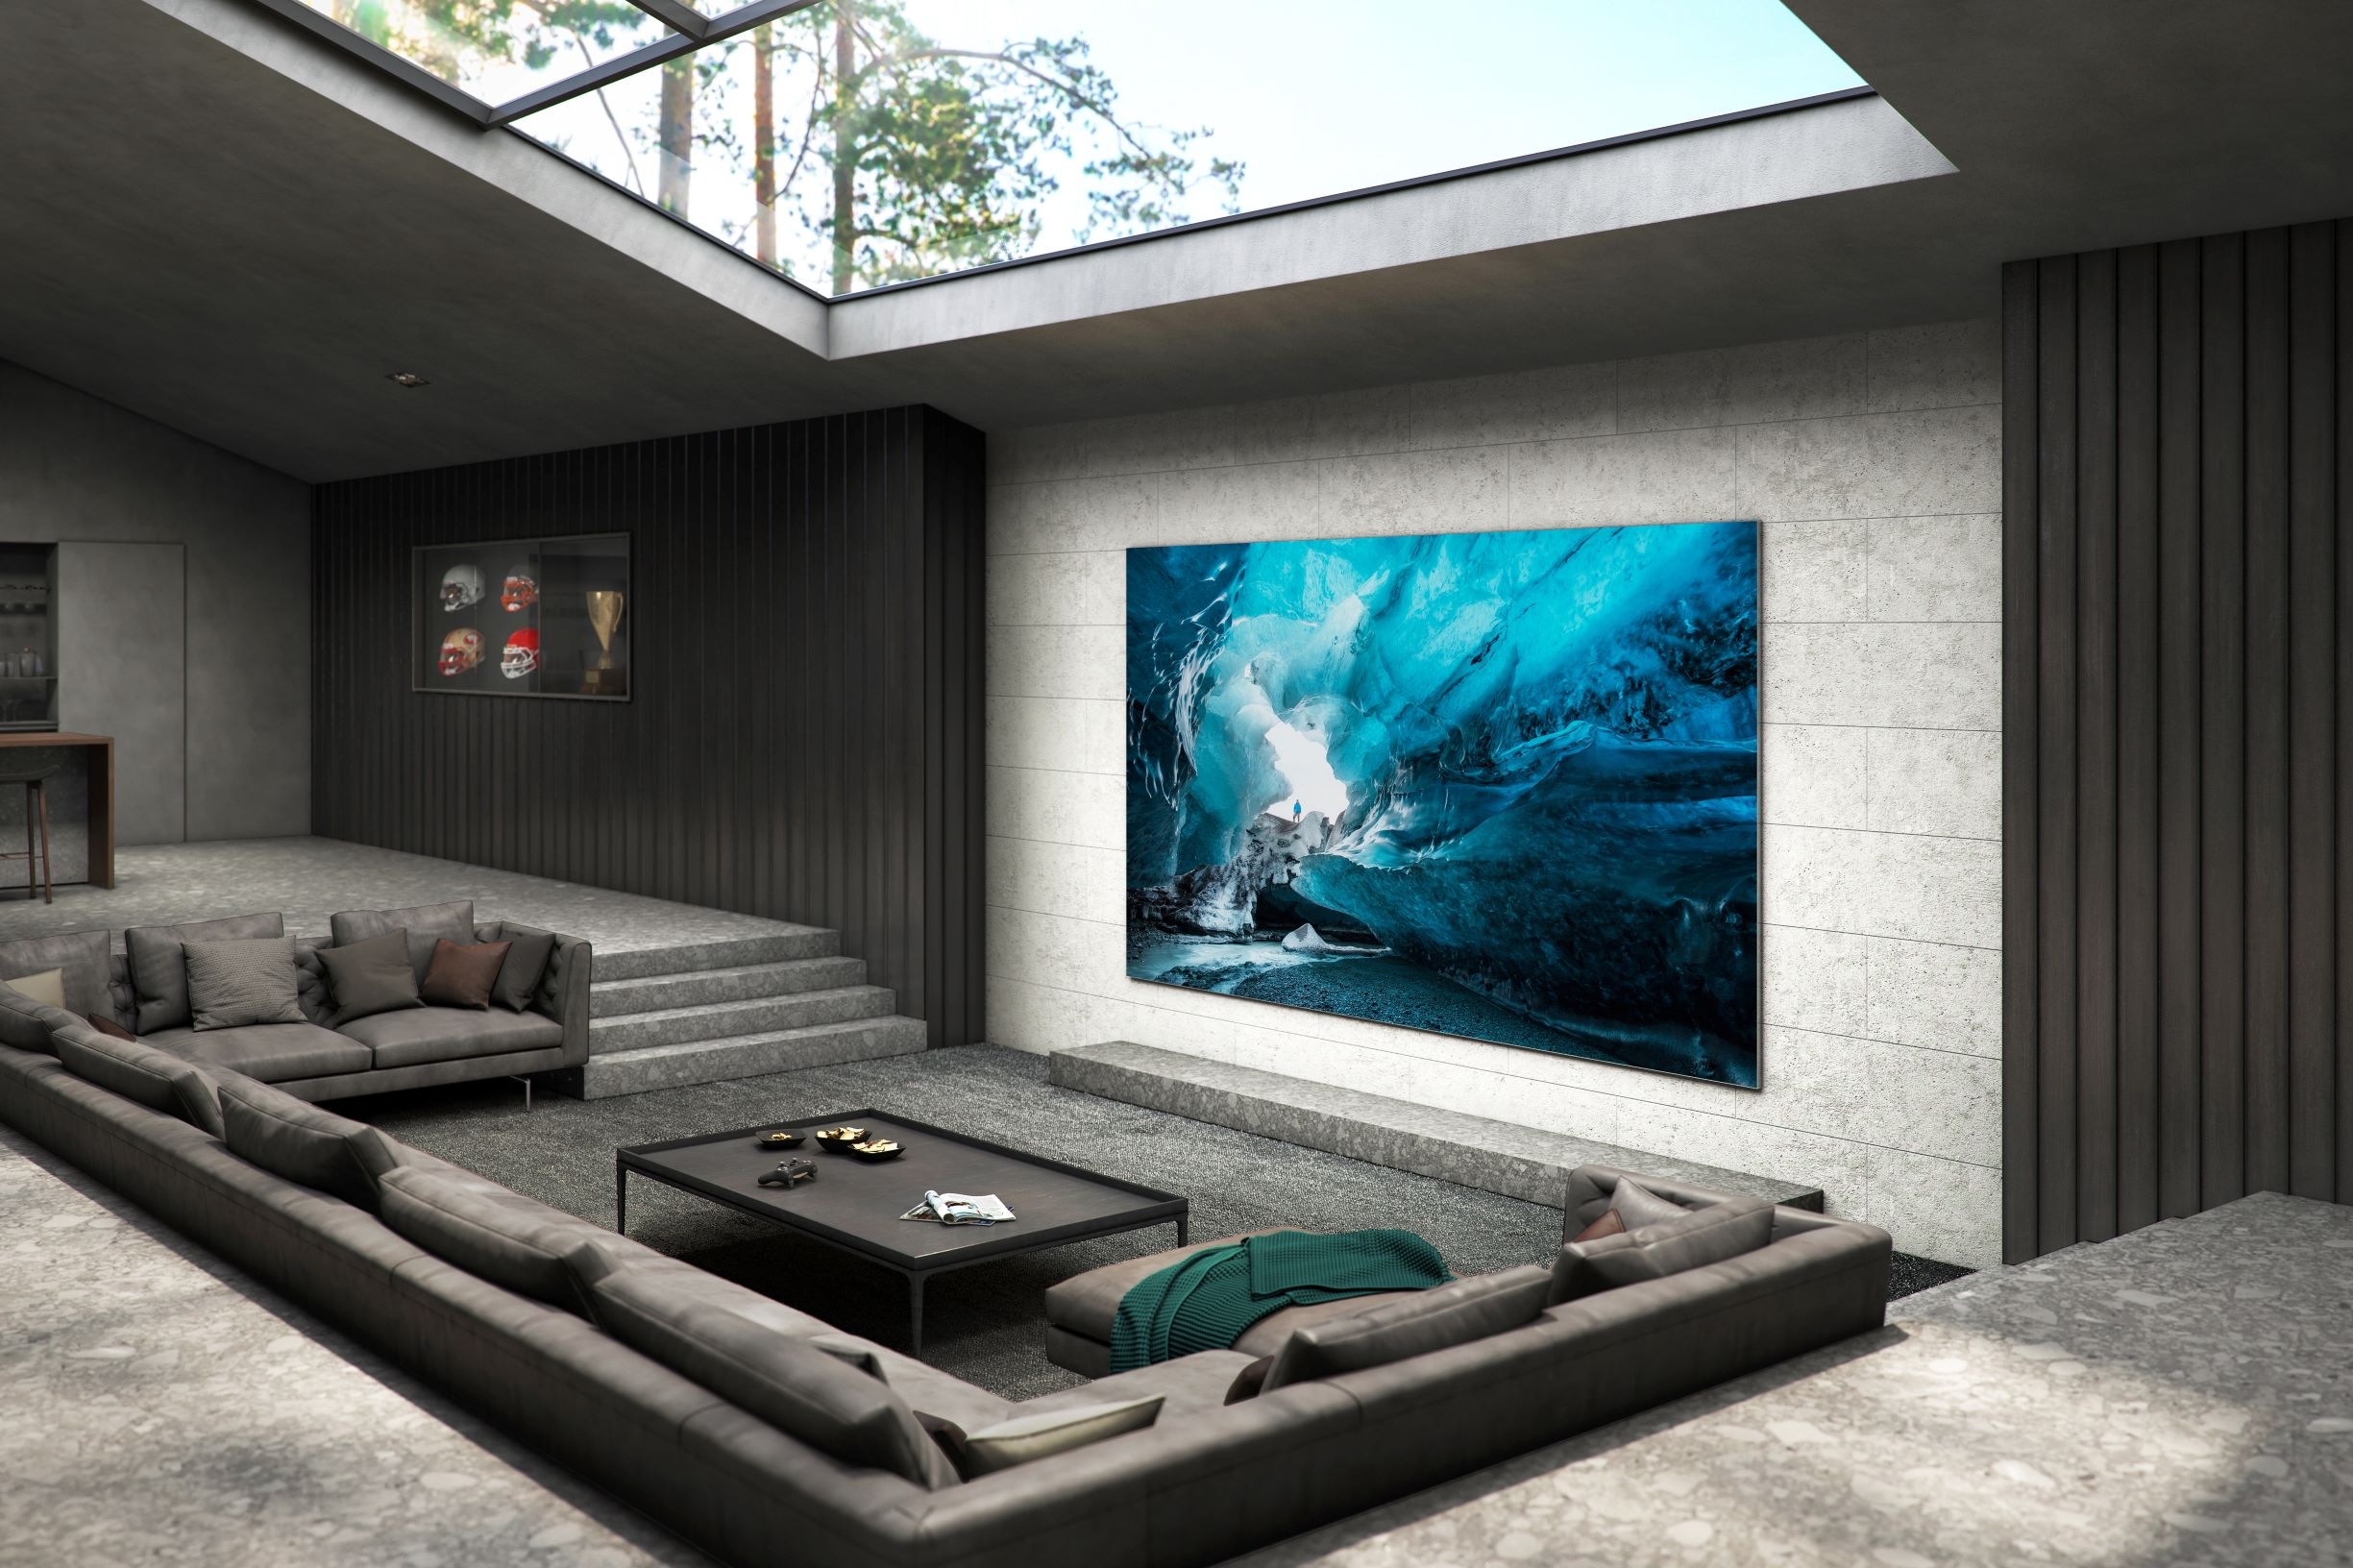 Telewizor Samsung MicroLED debiutuje na rynku